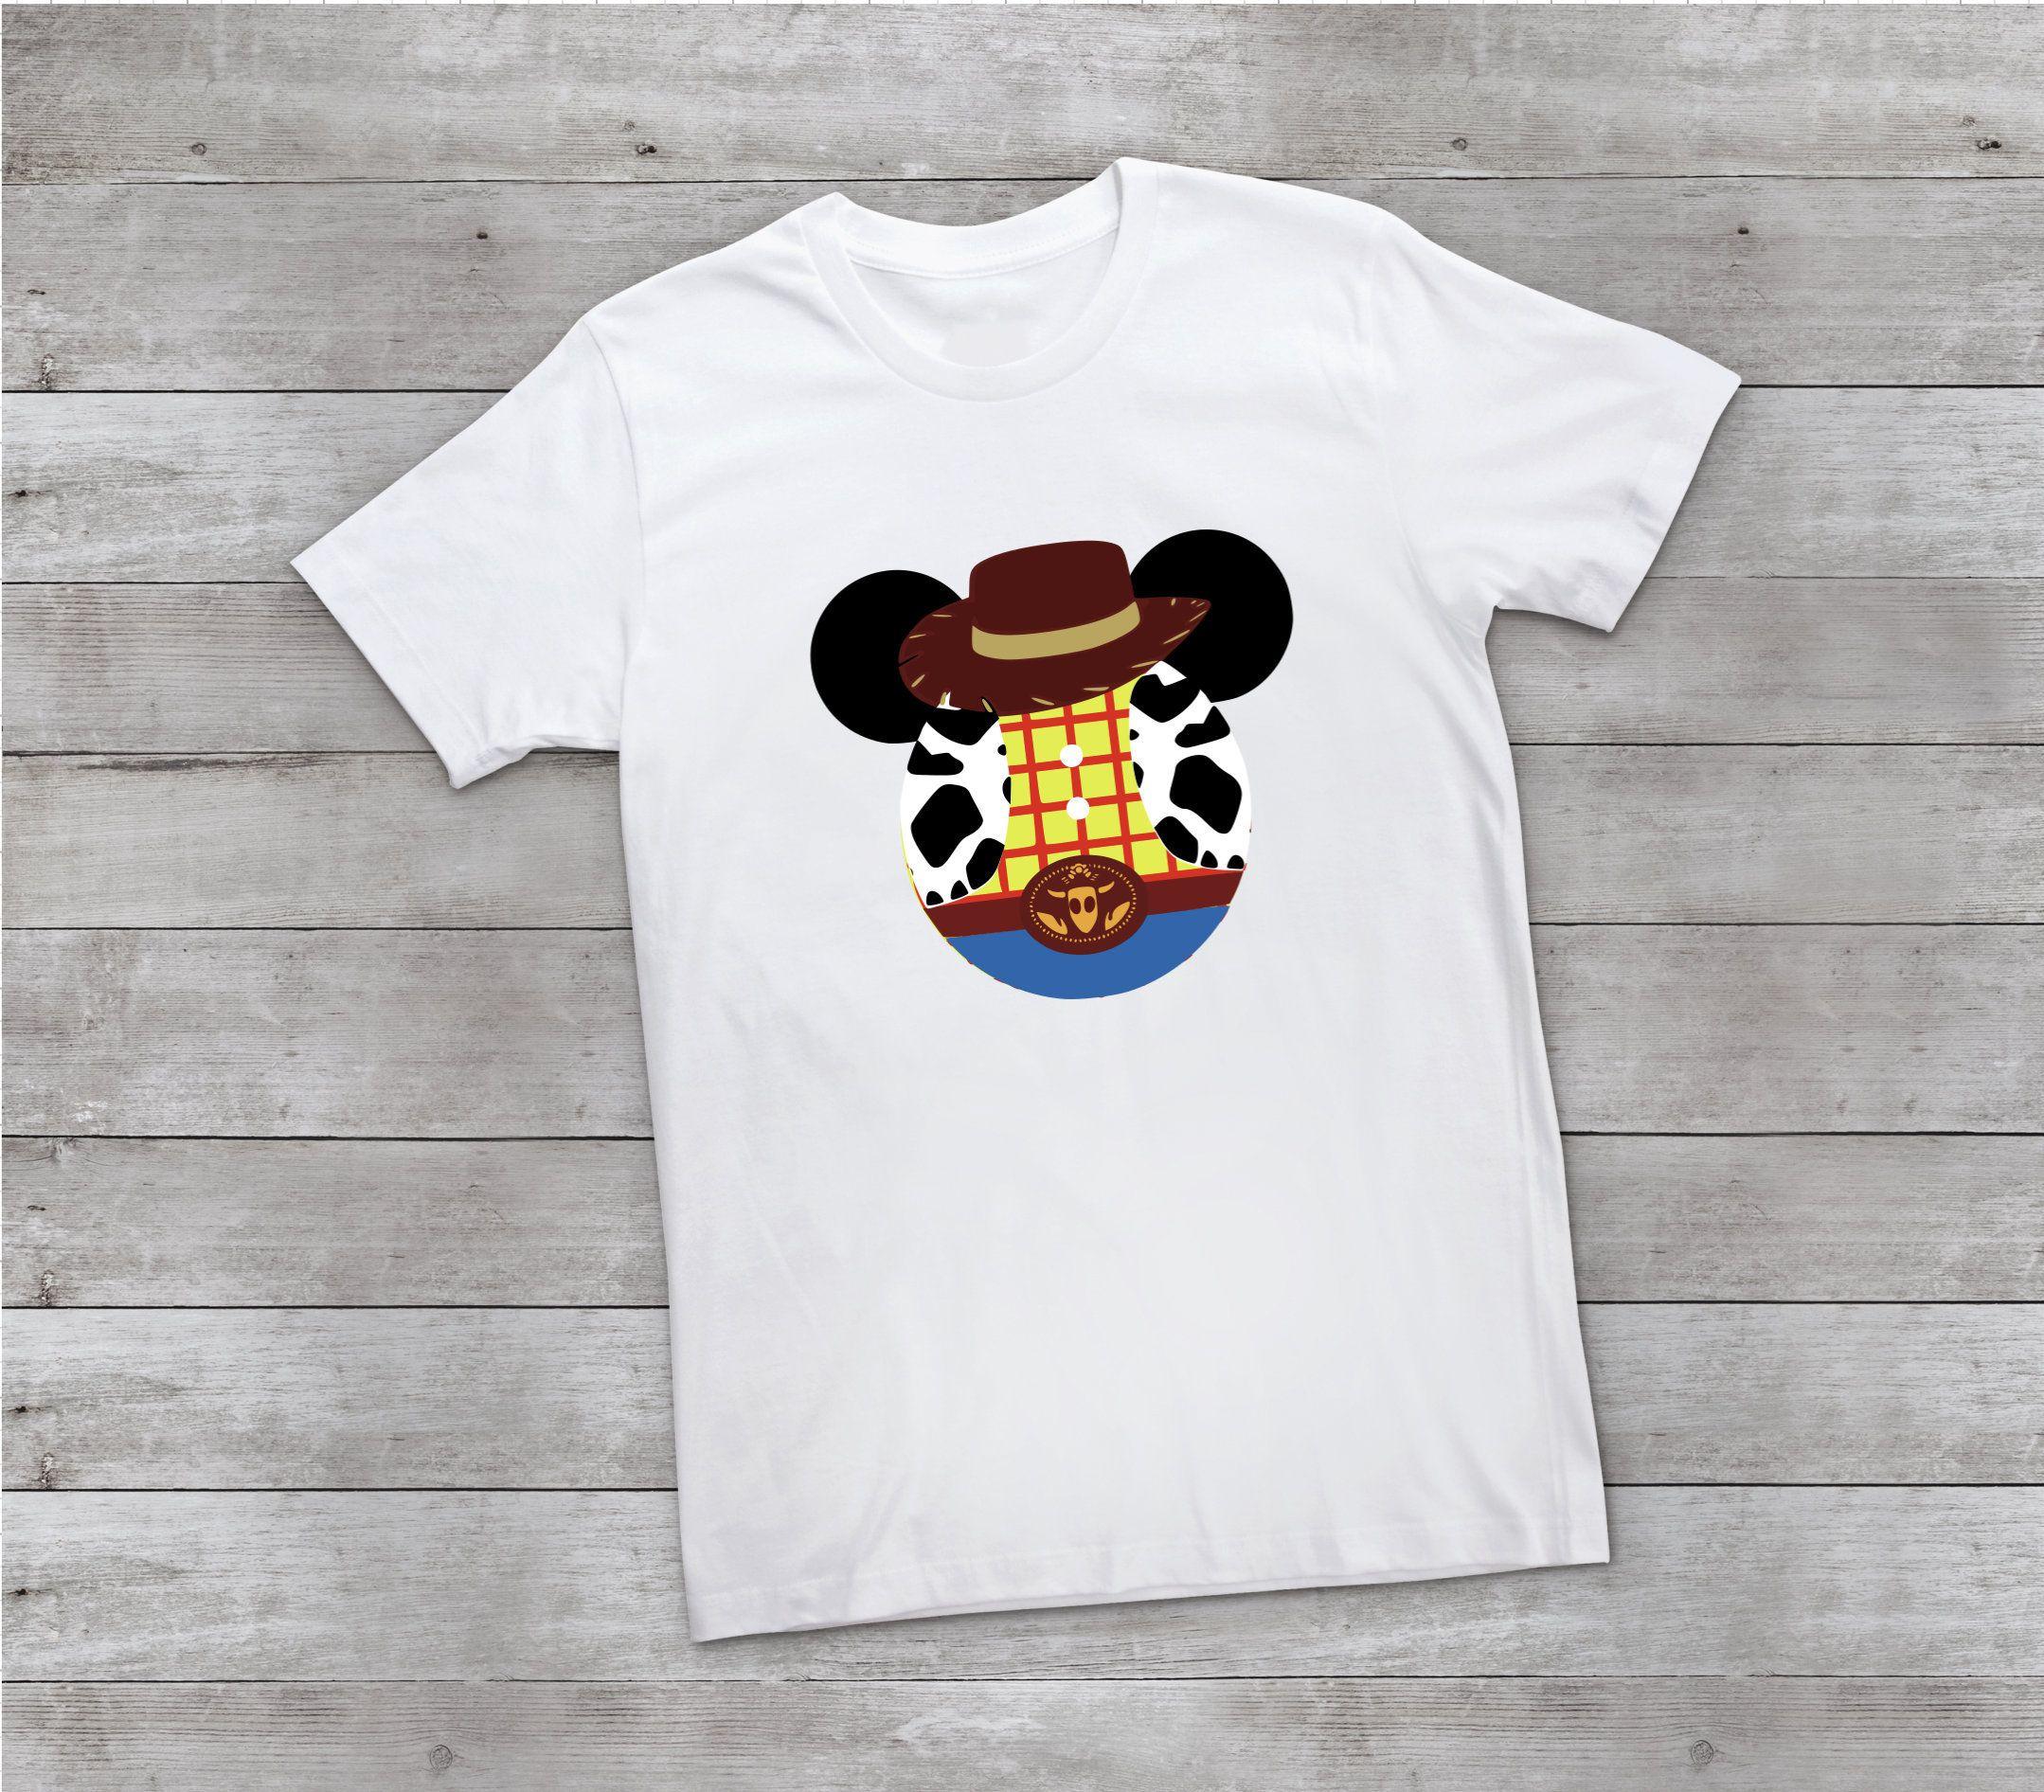 5762995891 Woody Mickey Shirt, Toy Story Woody Shirt, Disney Shirt, Disney Family  Shirts, Toy Story, Woody, Boys by ChicDesignsStudio on Etsy